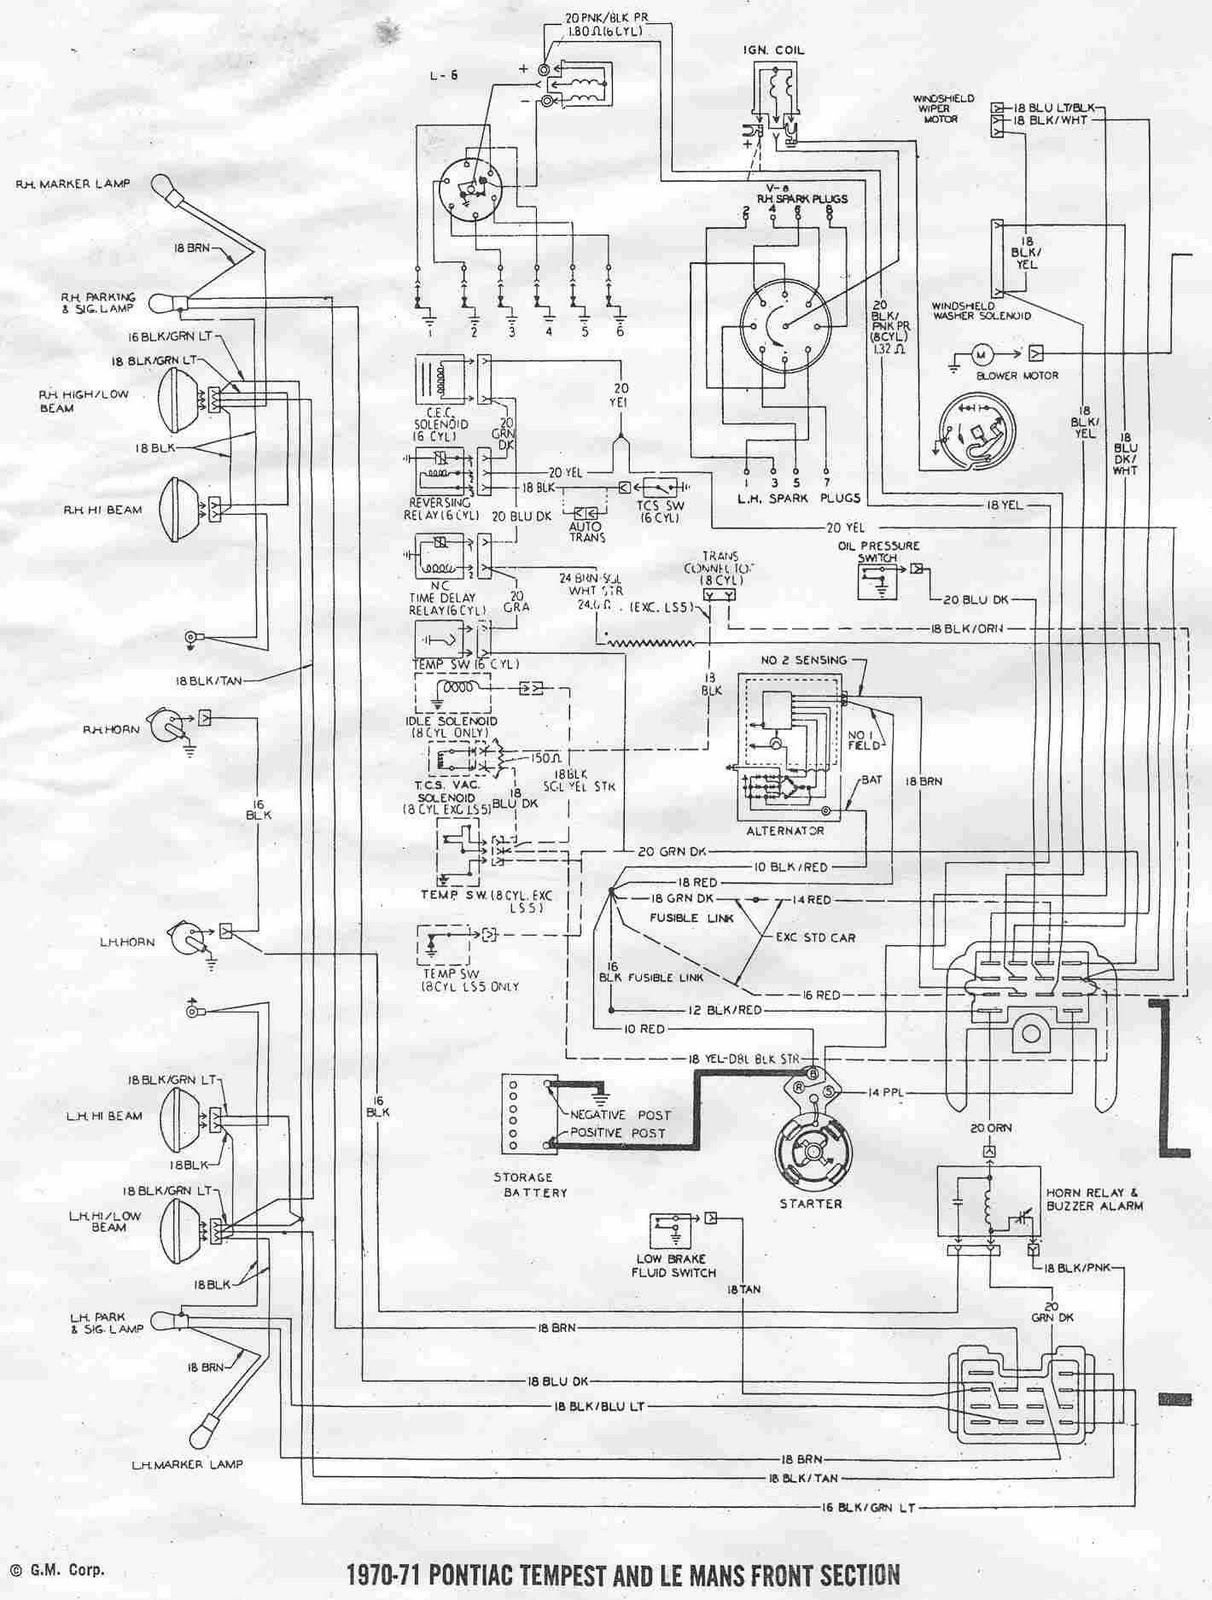 1970 Mobile Home Wiring Diagram Backup Light Cadillac Diagrams